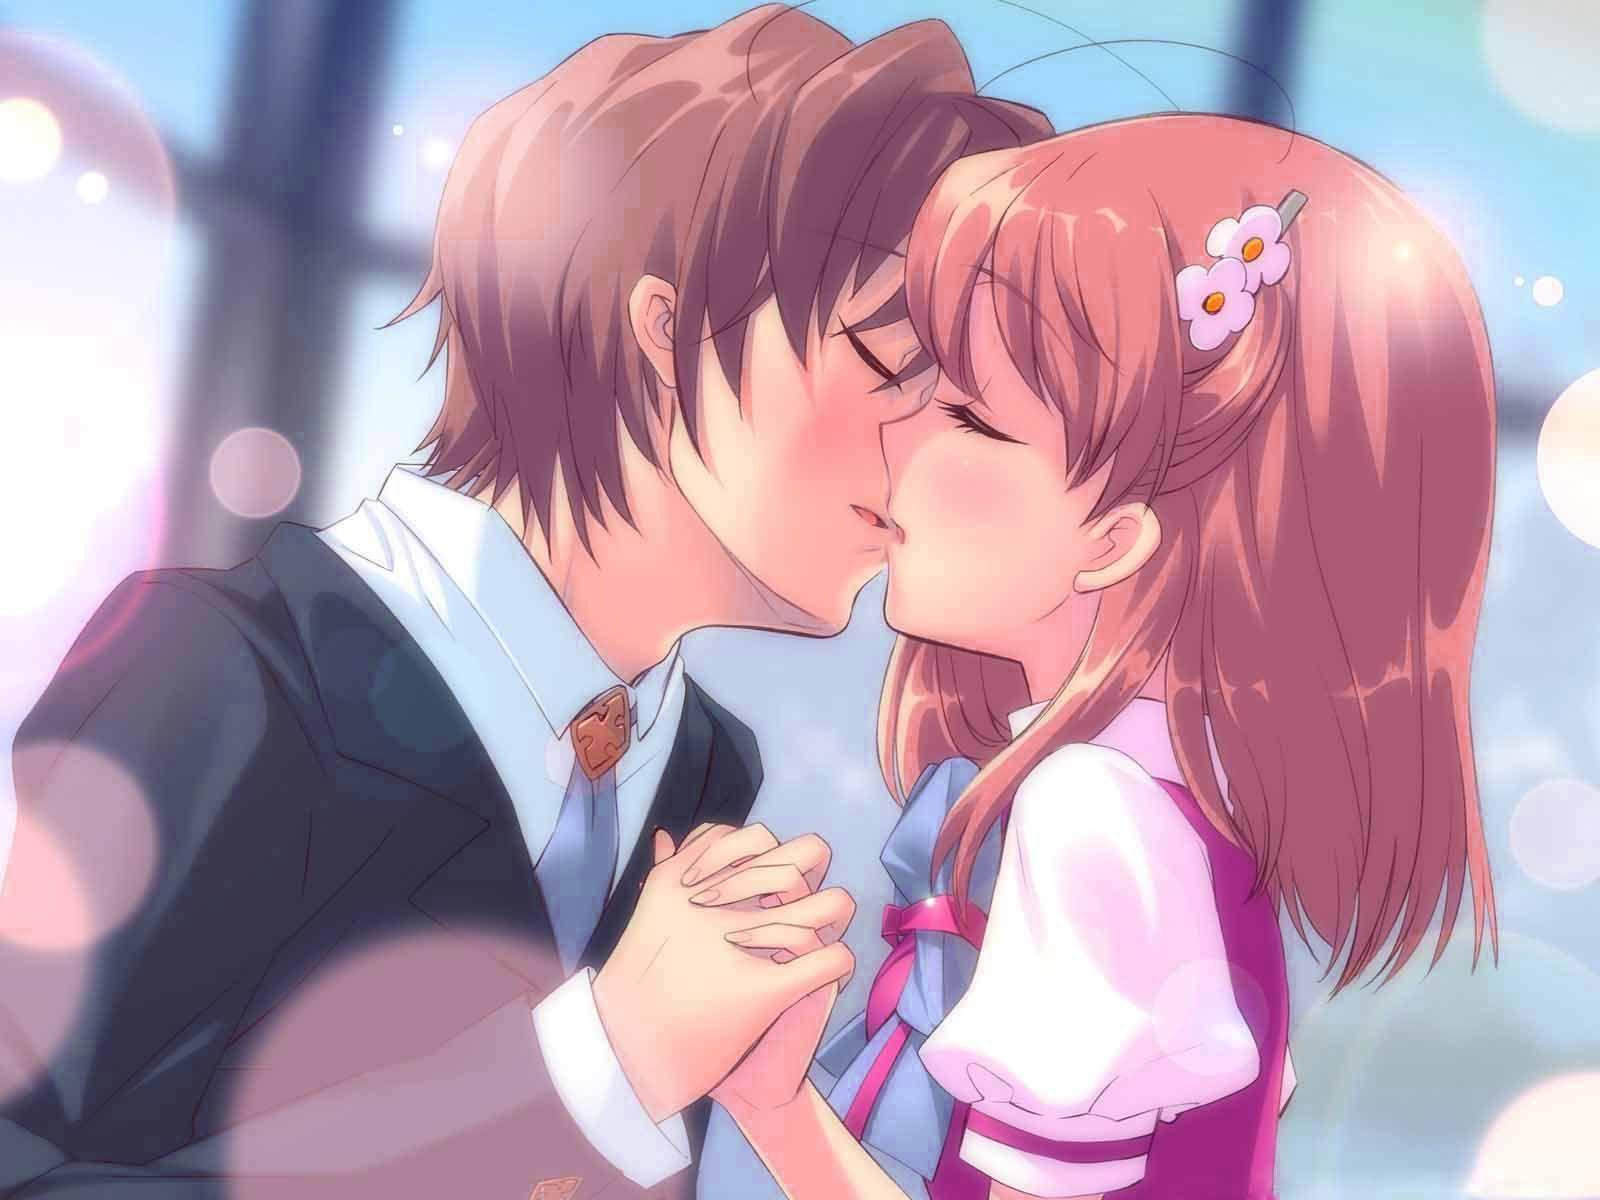 Happy Kiss Day Animated Wallpaper Manga Love Anime Kiss